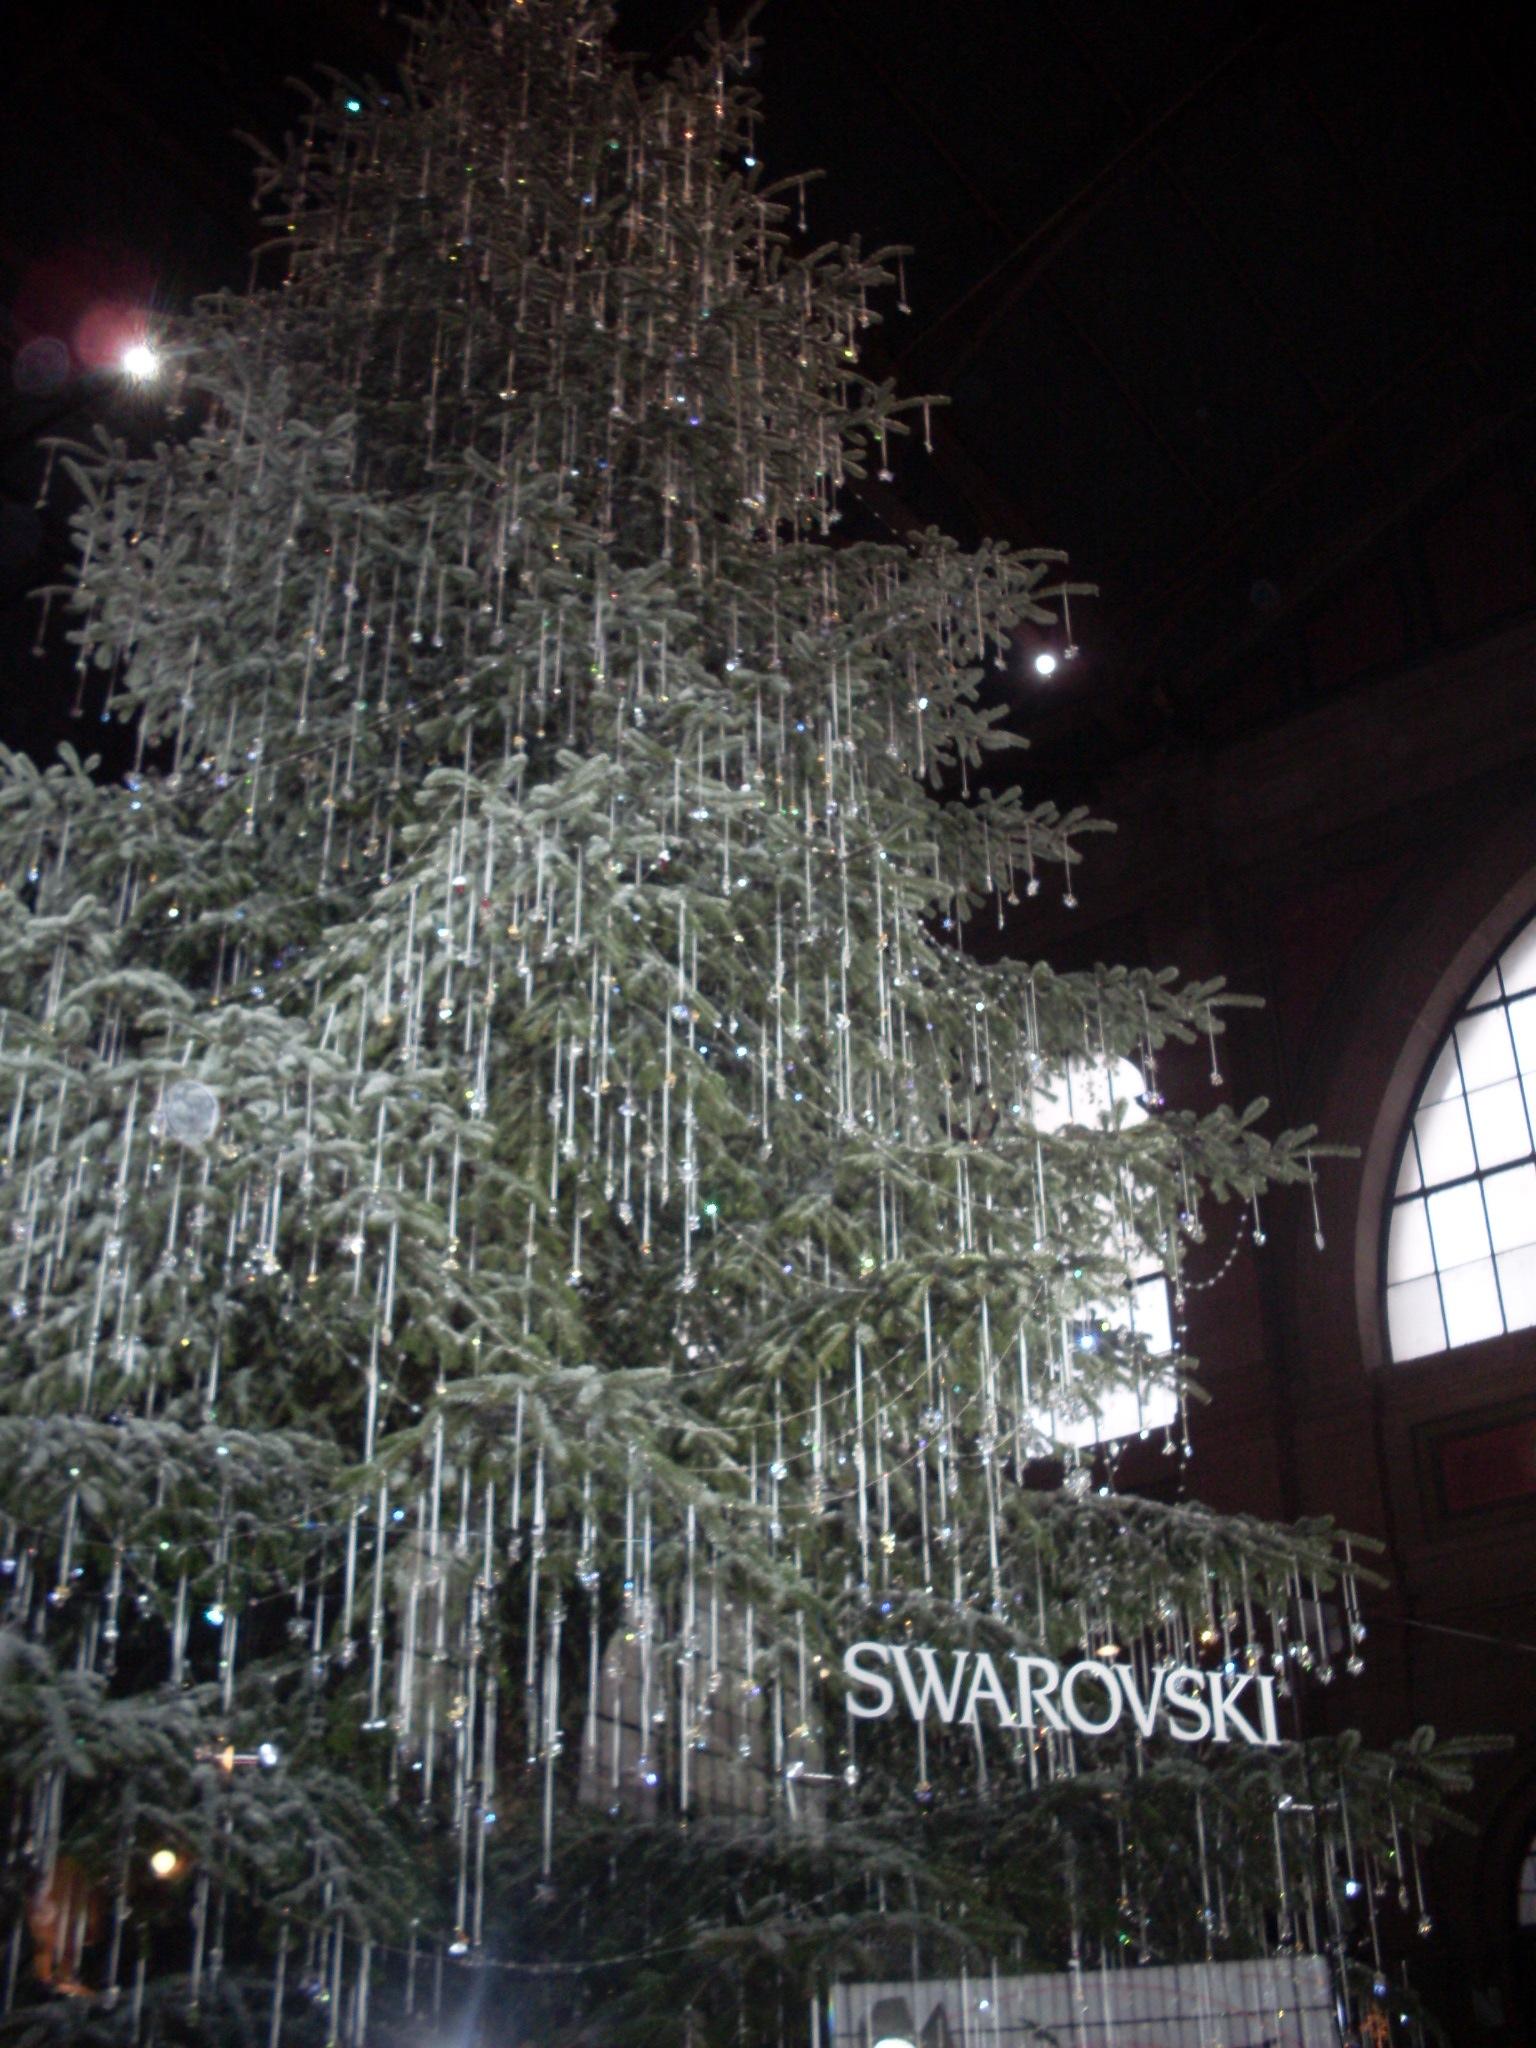 Alberi di Natale più belli d'Europa: Albero di Swaroski a Zurigo